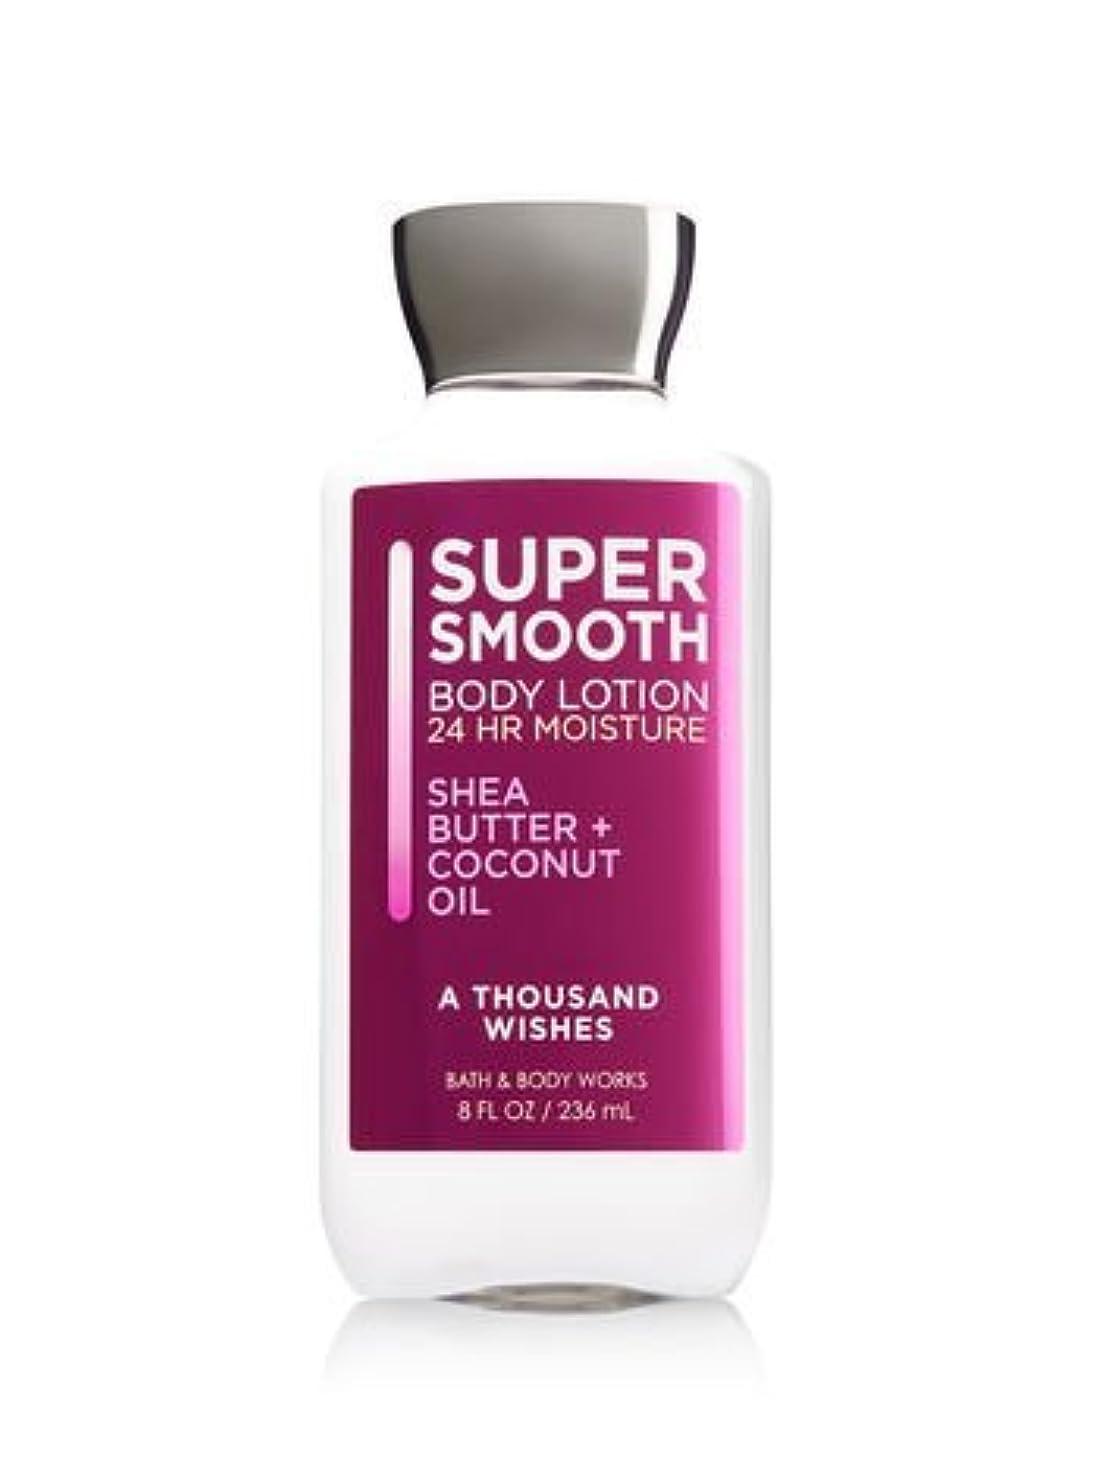 【Bath&Body Works/バス&ボディワークス】 ボディローション アサウザンドウィッシュ Super Smooth Body Lotion A Thousand Wishes 8 fl oz / 236 mL...